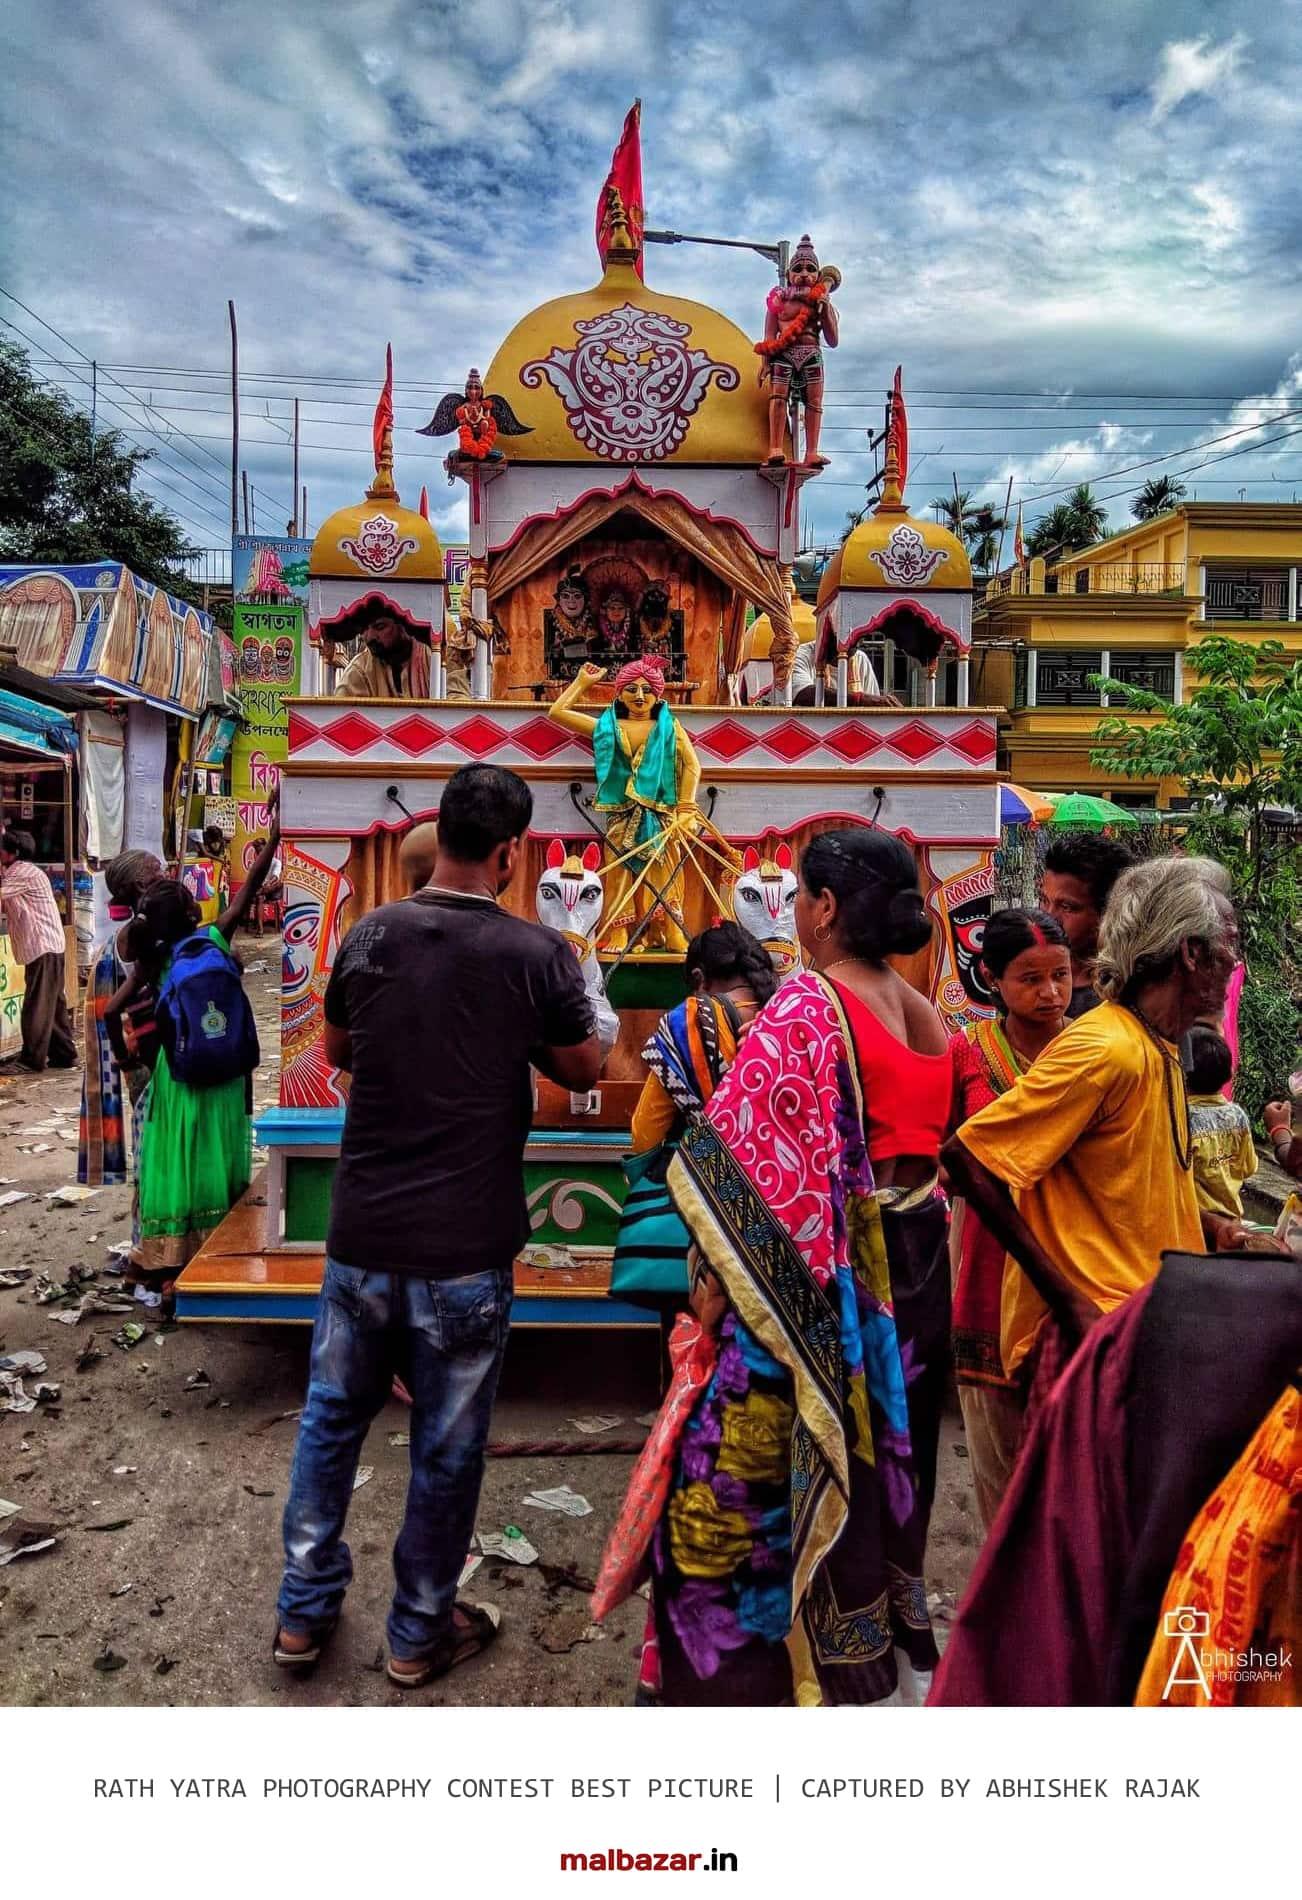 Rath Yatra in Malbazar 2018 by Abhishek RajaK